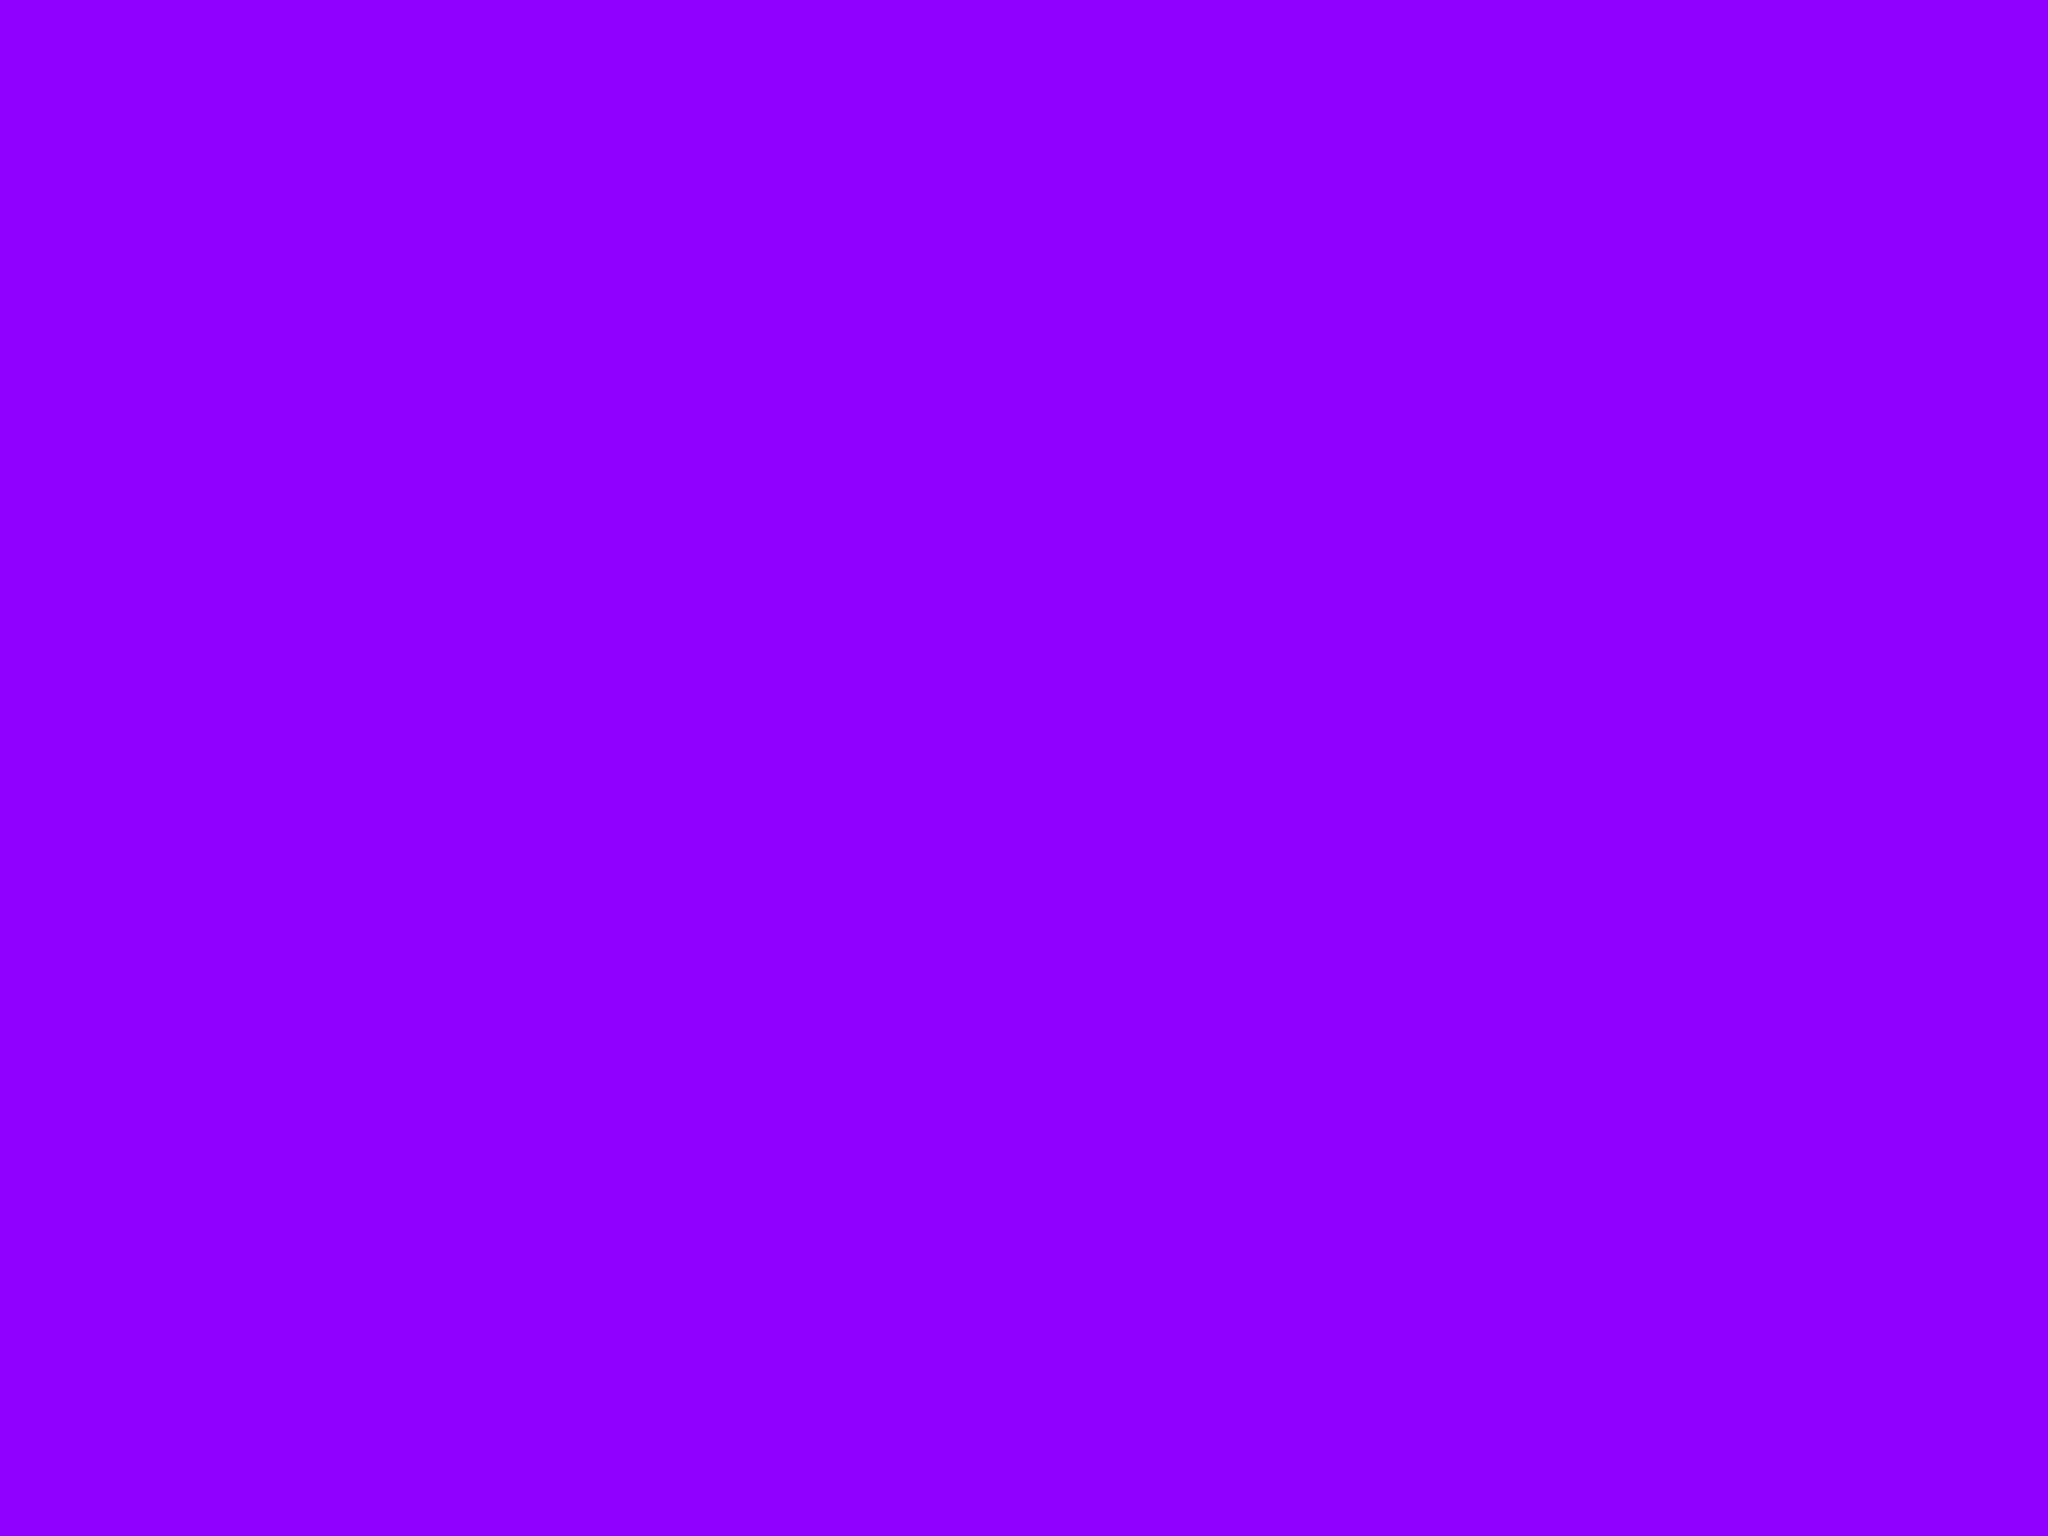 2048x1536 Electric Violet Solid Color Background